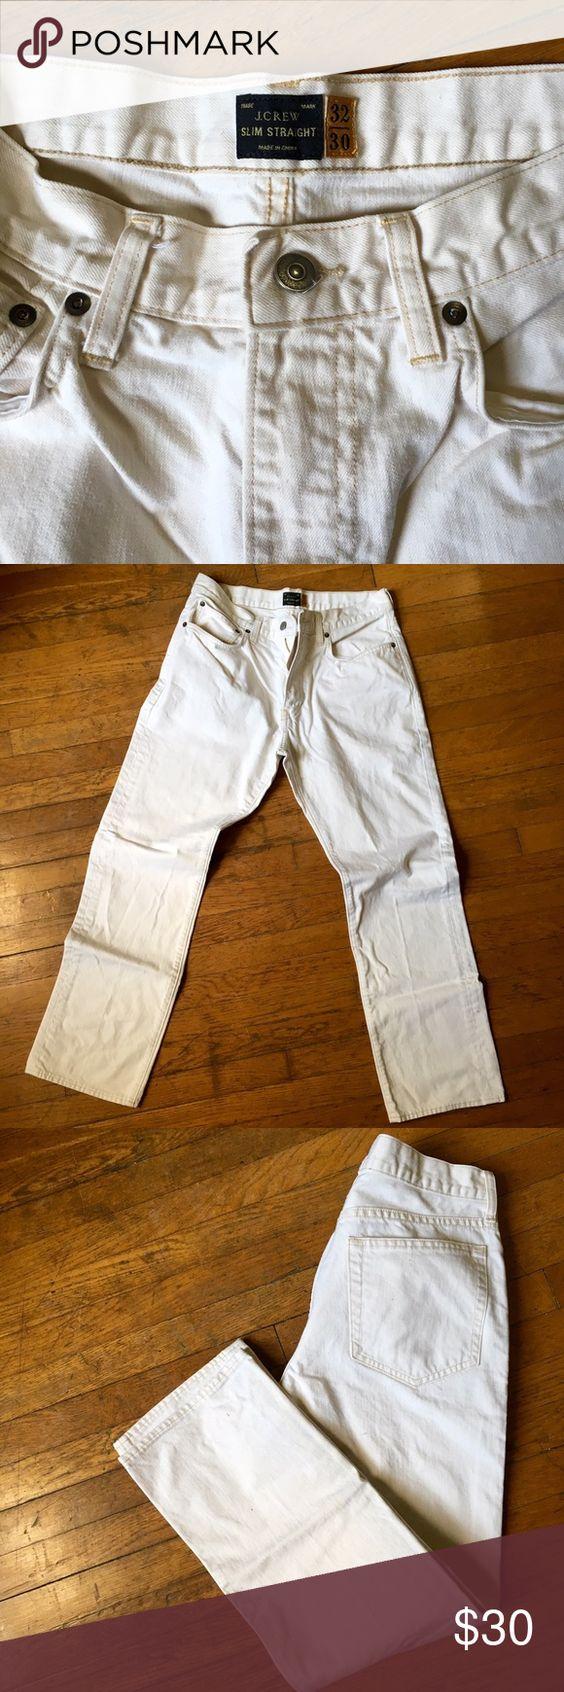 J.Crew Jeans Men's J.Crew Slim Straight Jeans, Off-White J. Crew Jeans Slim Straight